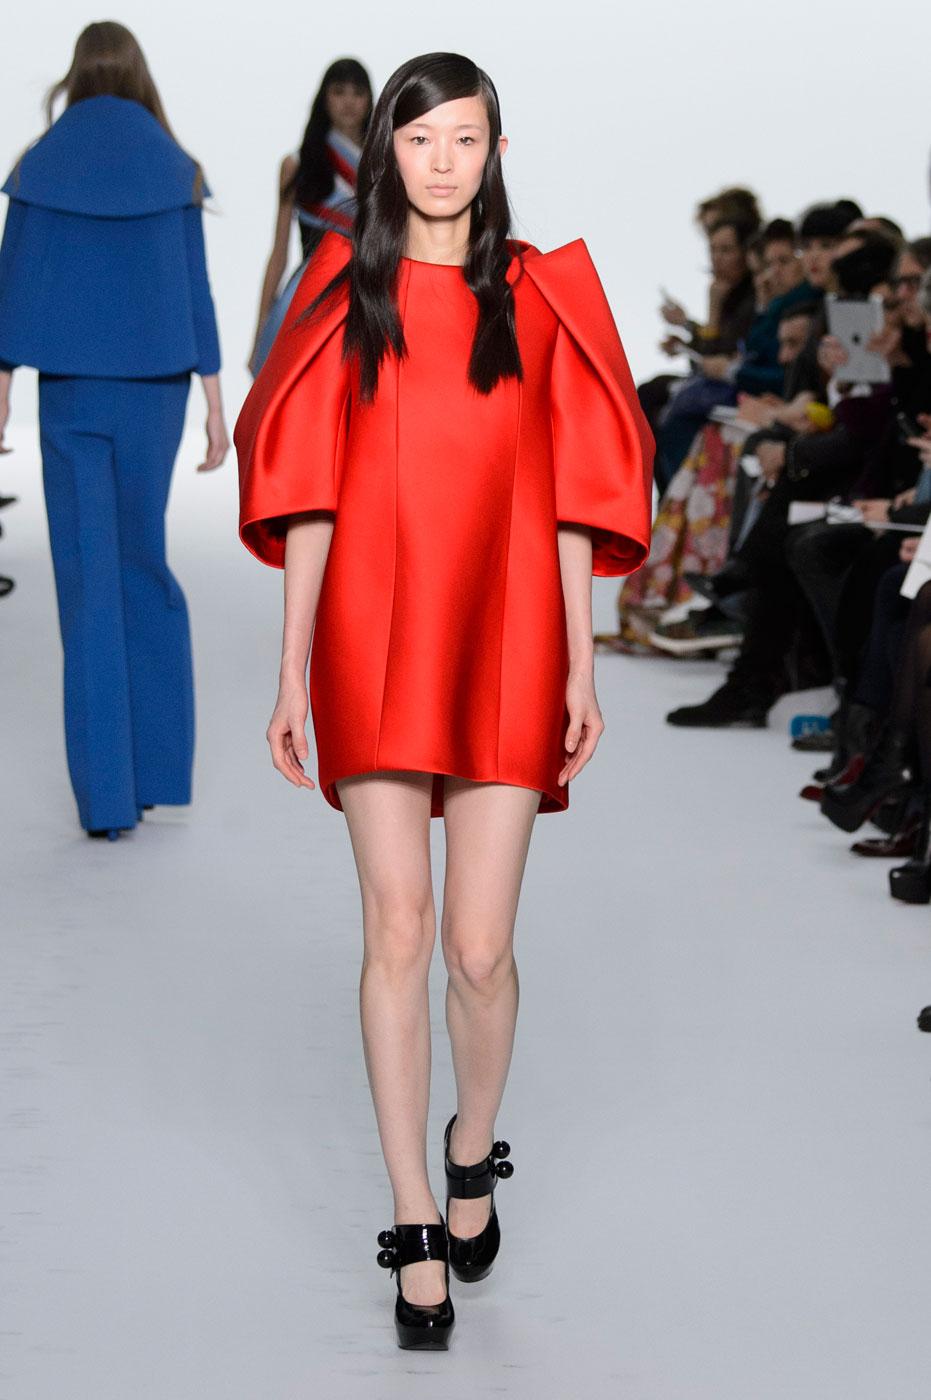 Kayek-fashion-runway-show-haute-couture-paris-spring-summer-2015-the-impression-25